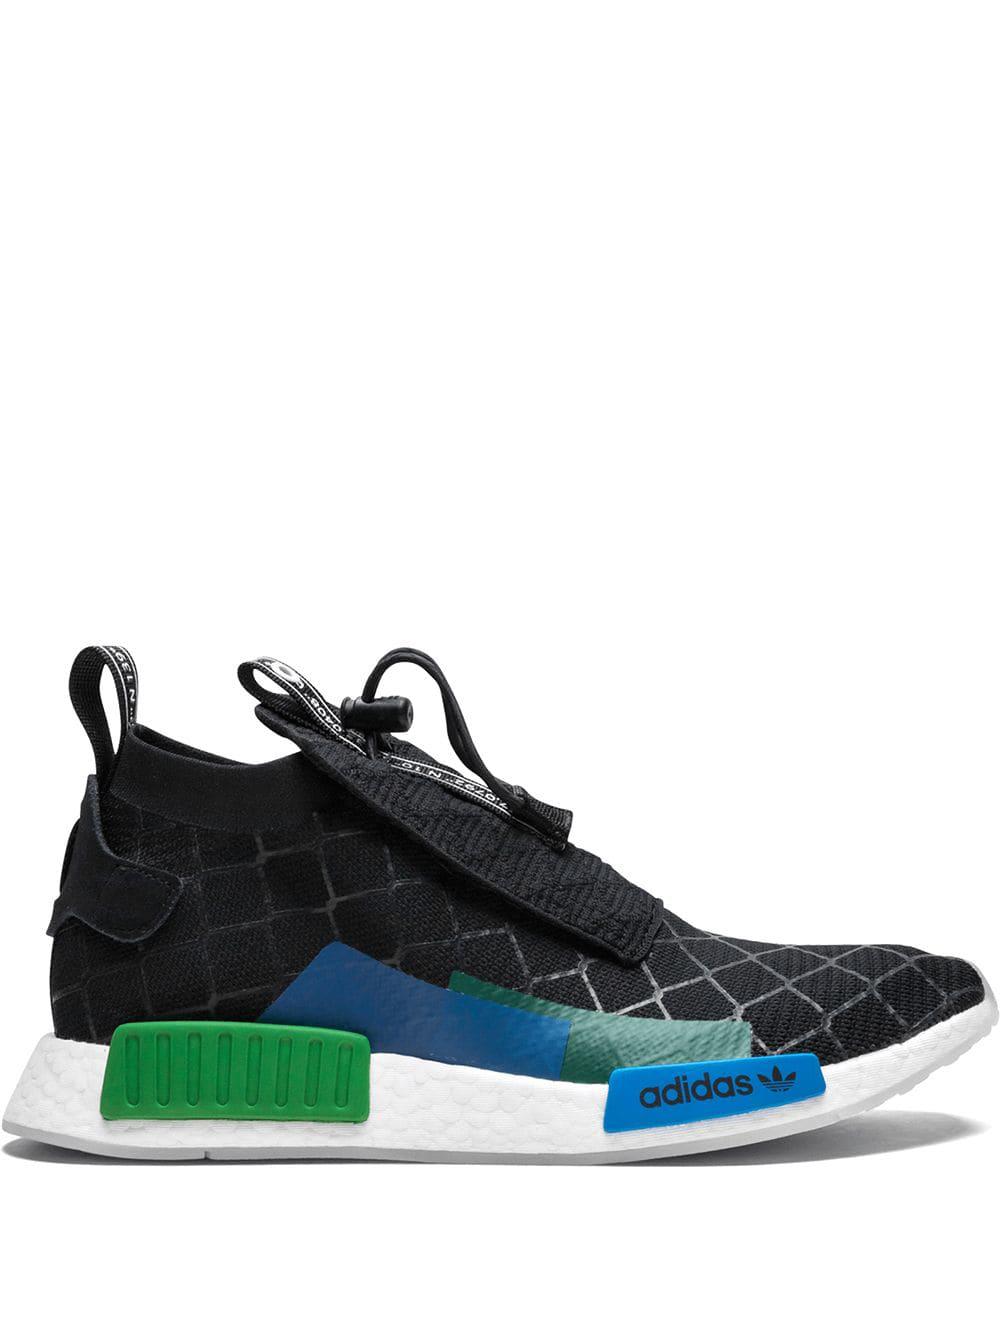 5044793f40bc5 Adidas Originals Adidas Nmd Ts1 Gore-Tex Primeknit Sneakers - Black ...